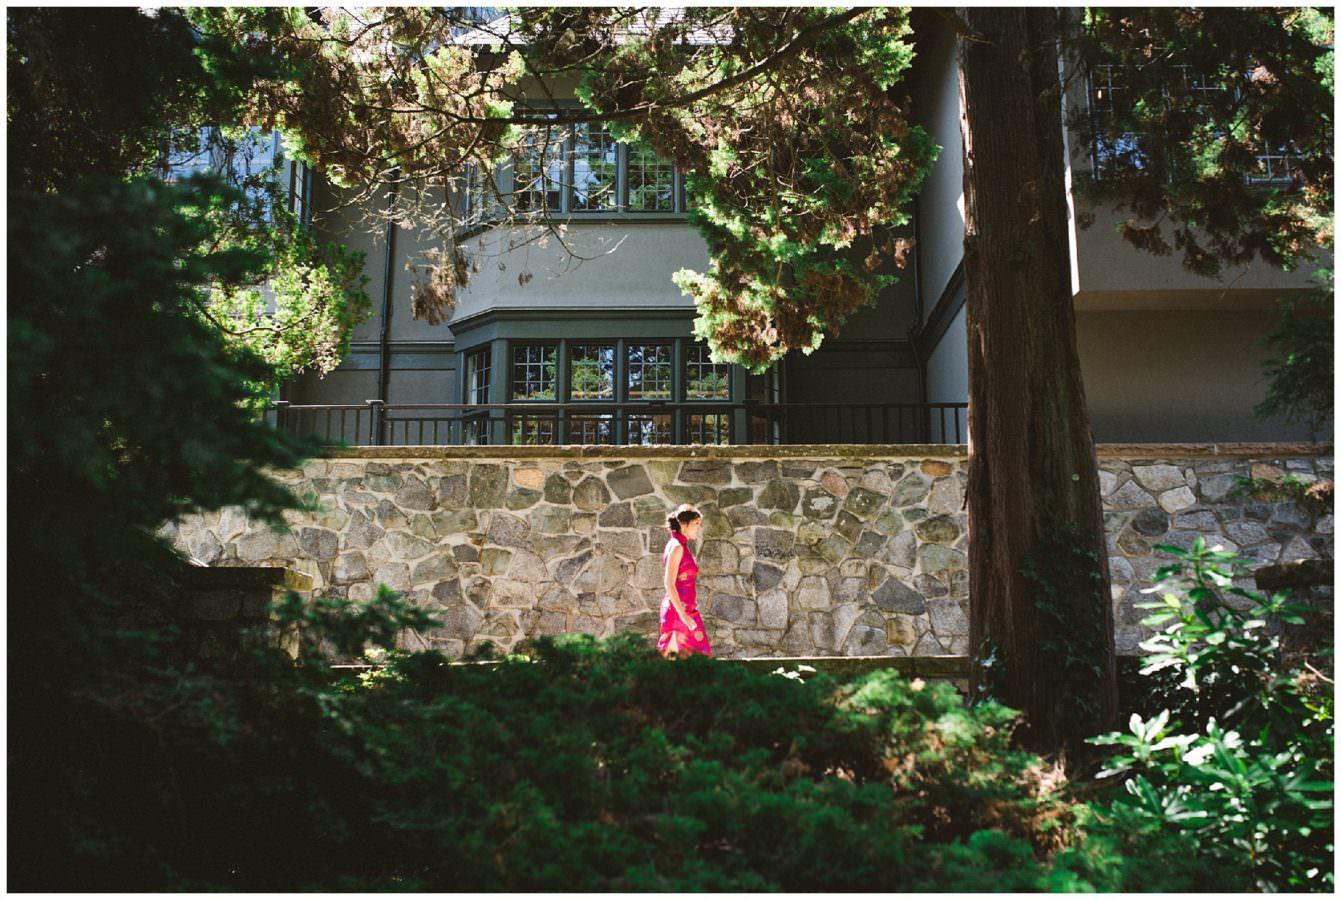 CecilGreenParkhouseWedding_Vancouver_RonnieLeeHillPhotography_1018